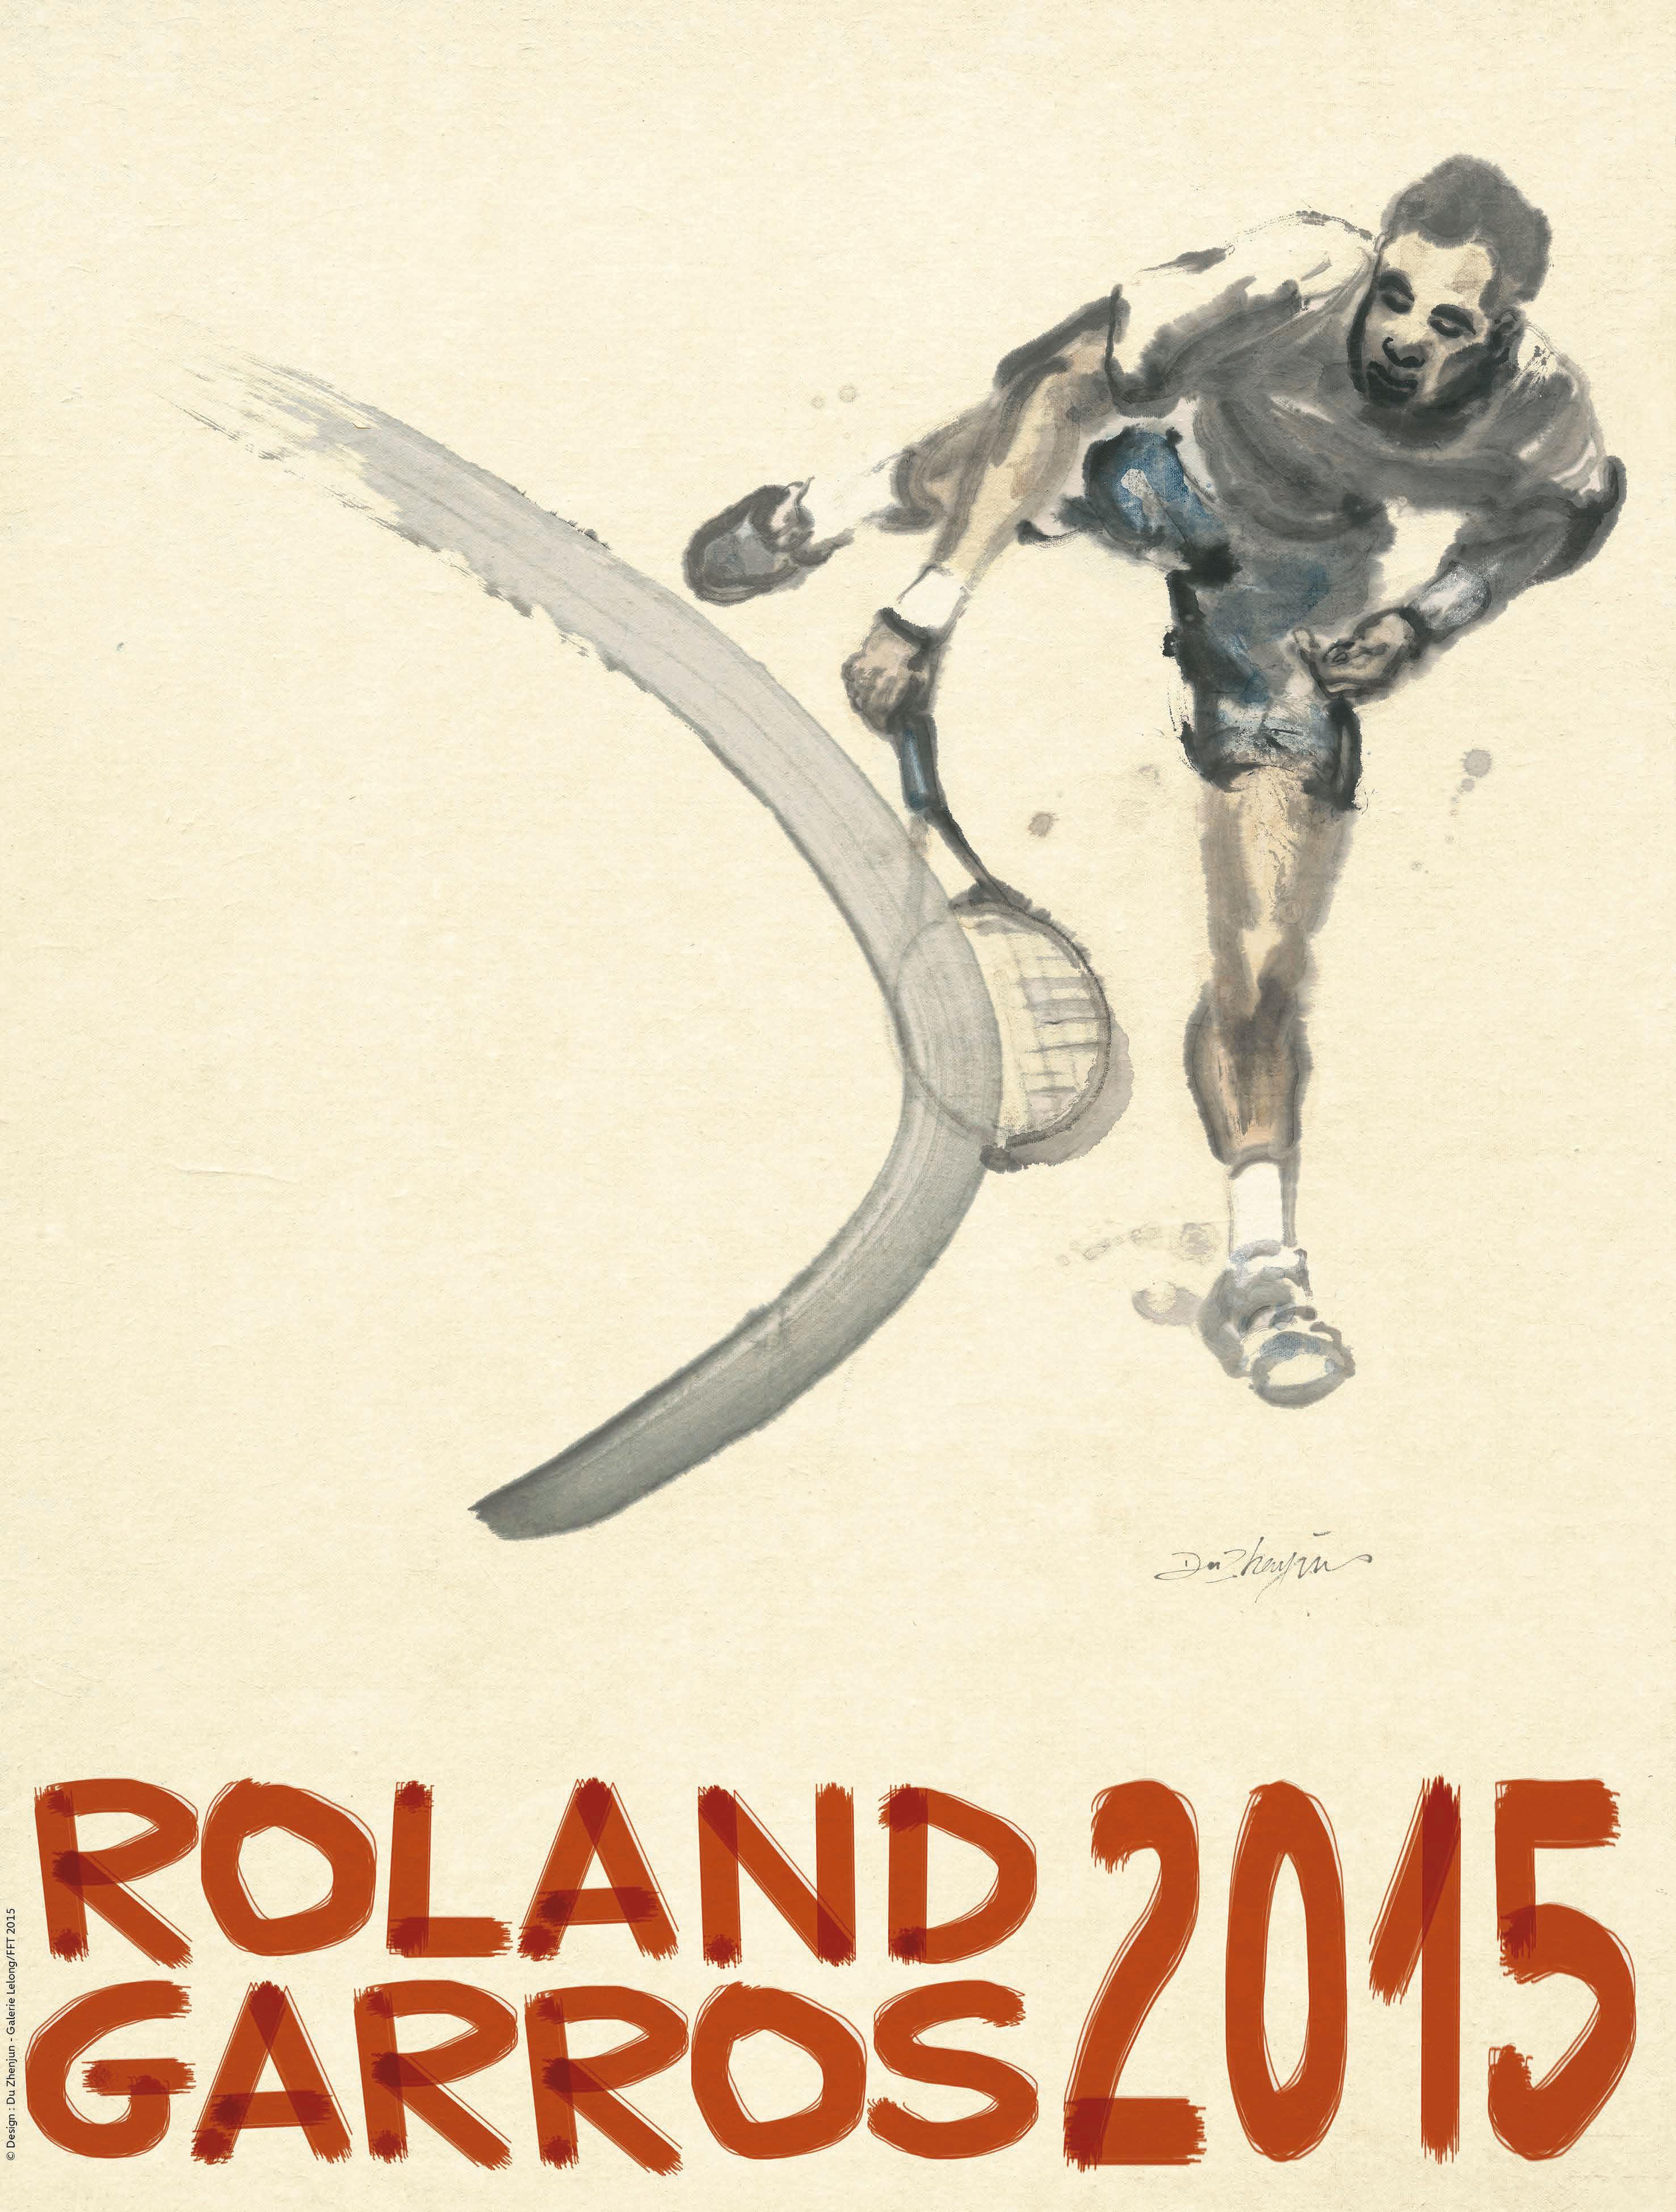 roland garros, roland garros 2015, Peugeot, 108, 208, tennis, djokovic, nadal, federe